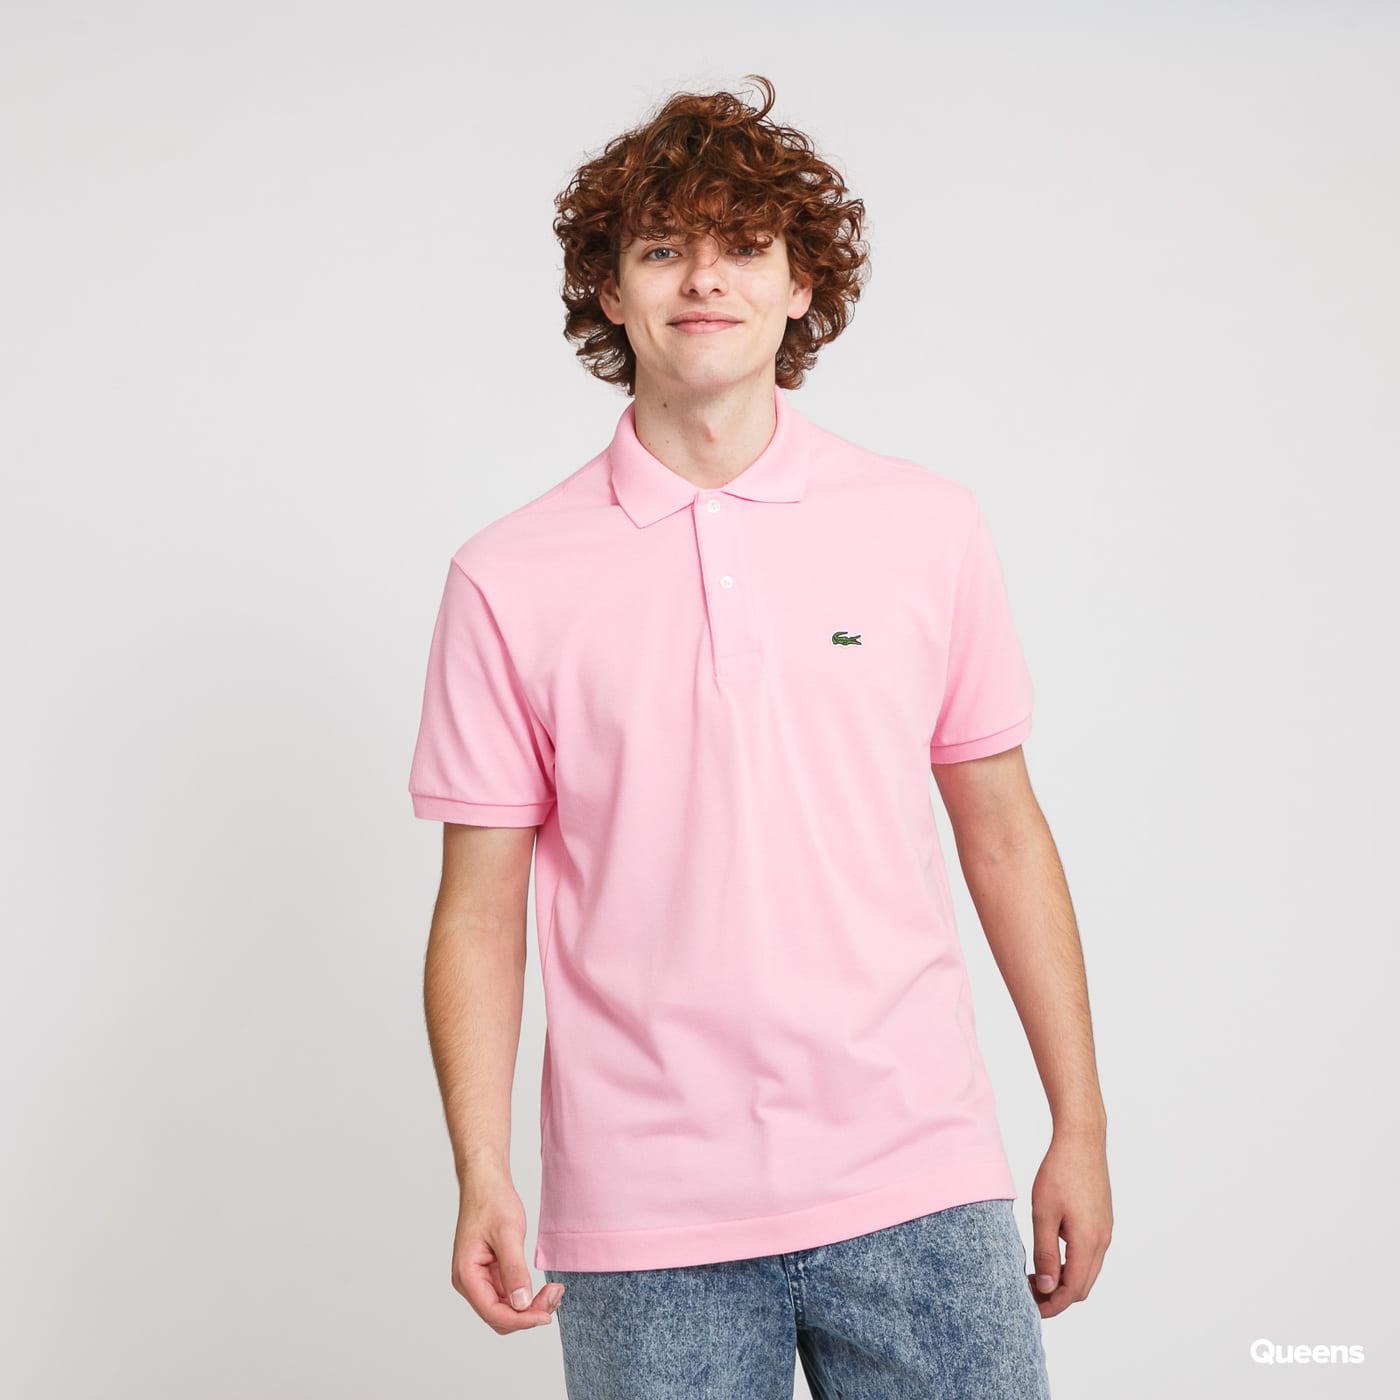 LACOSTE Men's Polo T-Shirt pink